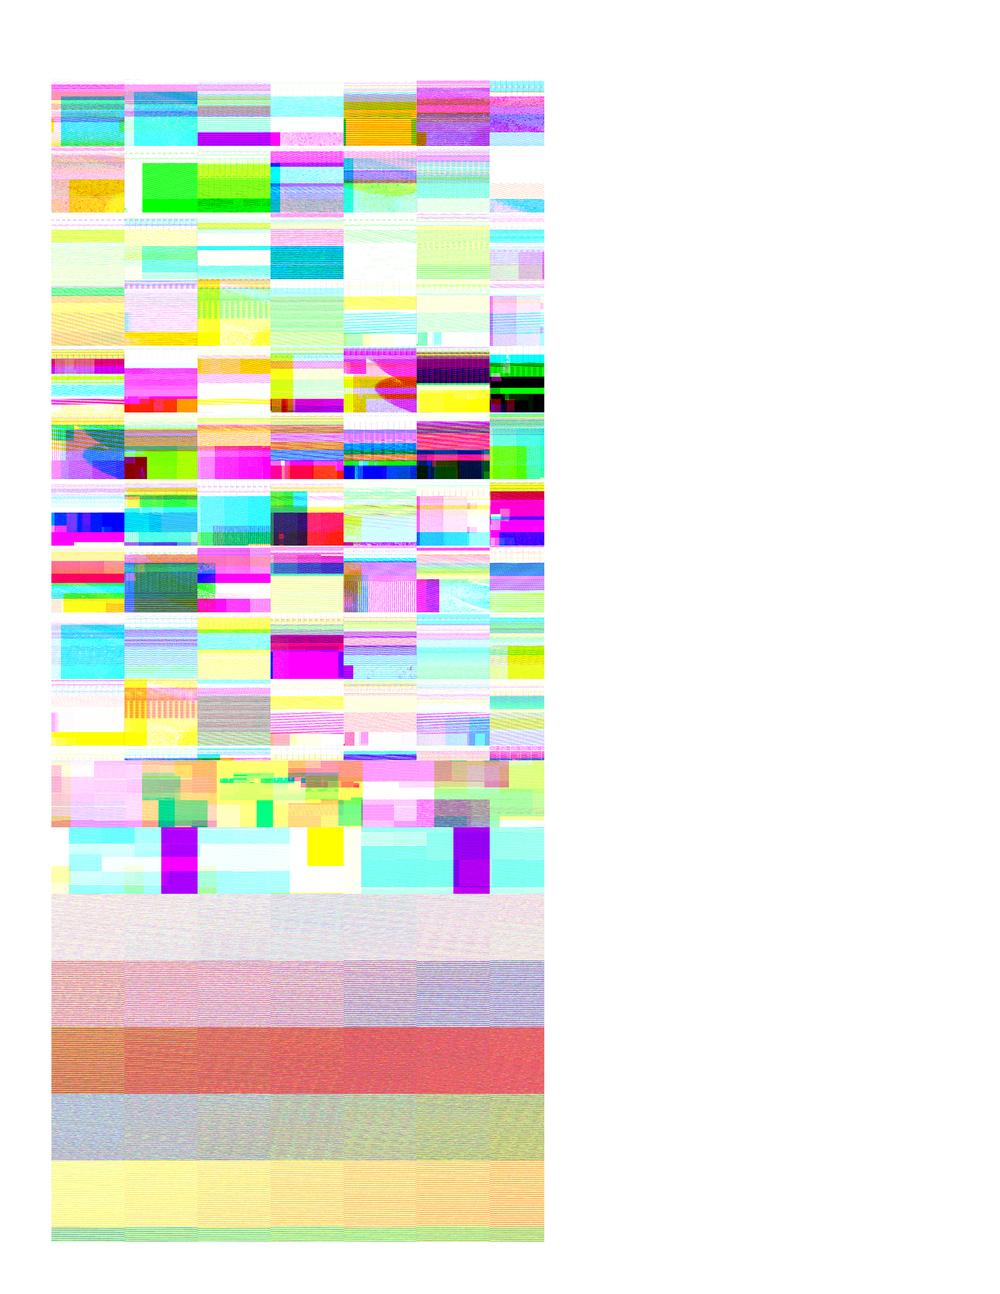 Untitled-x3.jpg